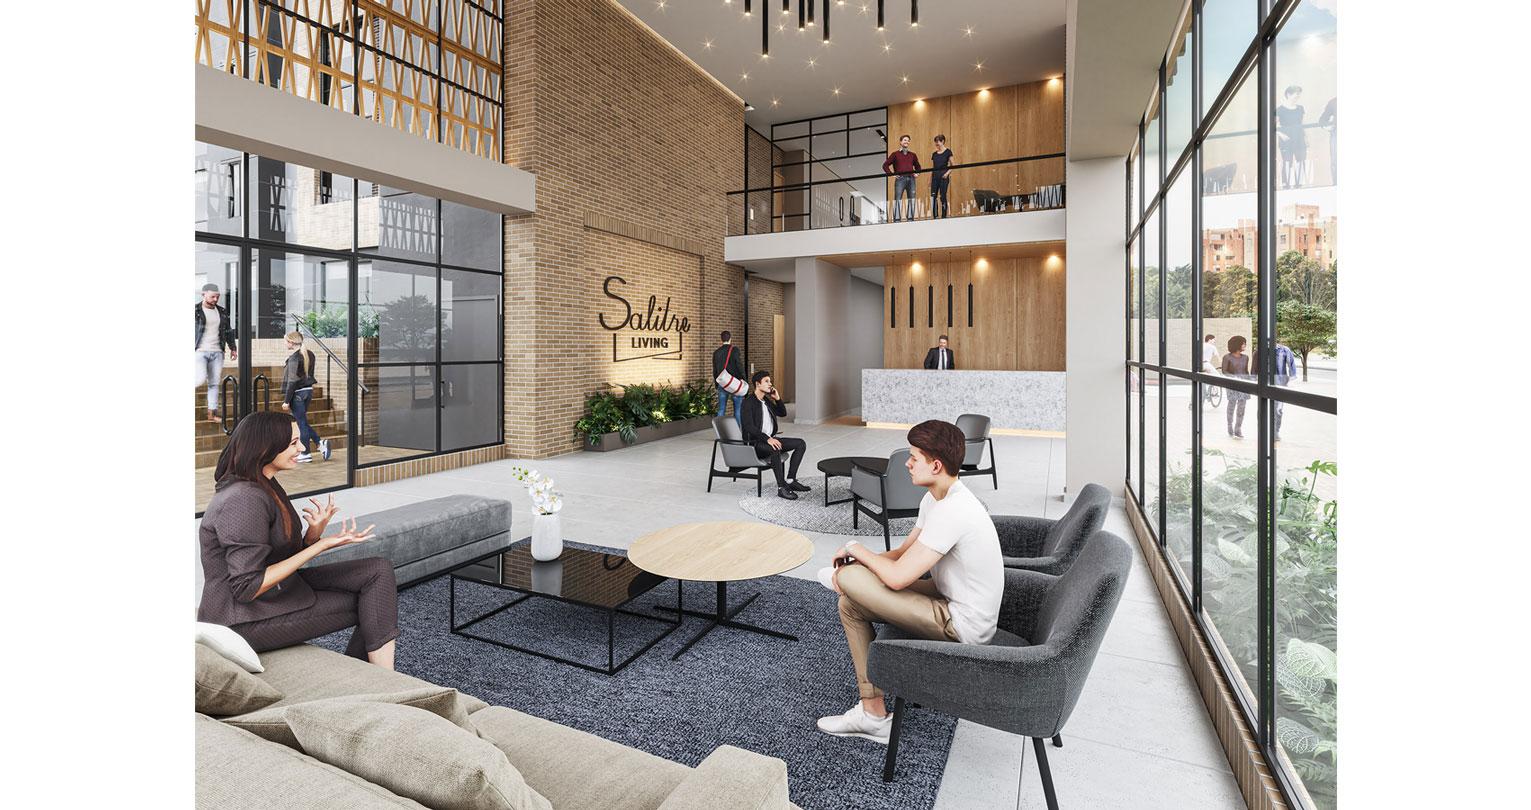 Salitre Living proyecto de apartamentos en Bogota Constructora Bolivar